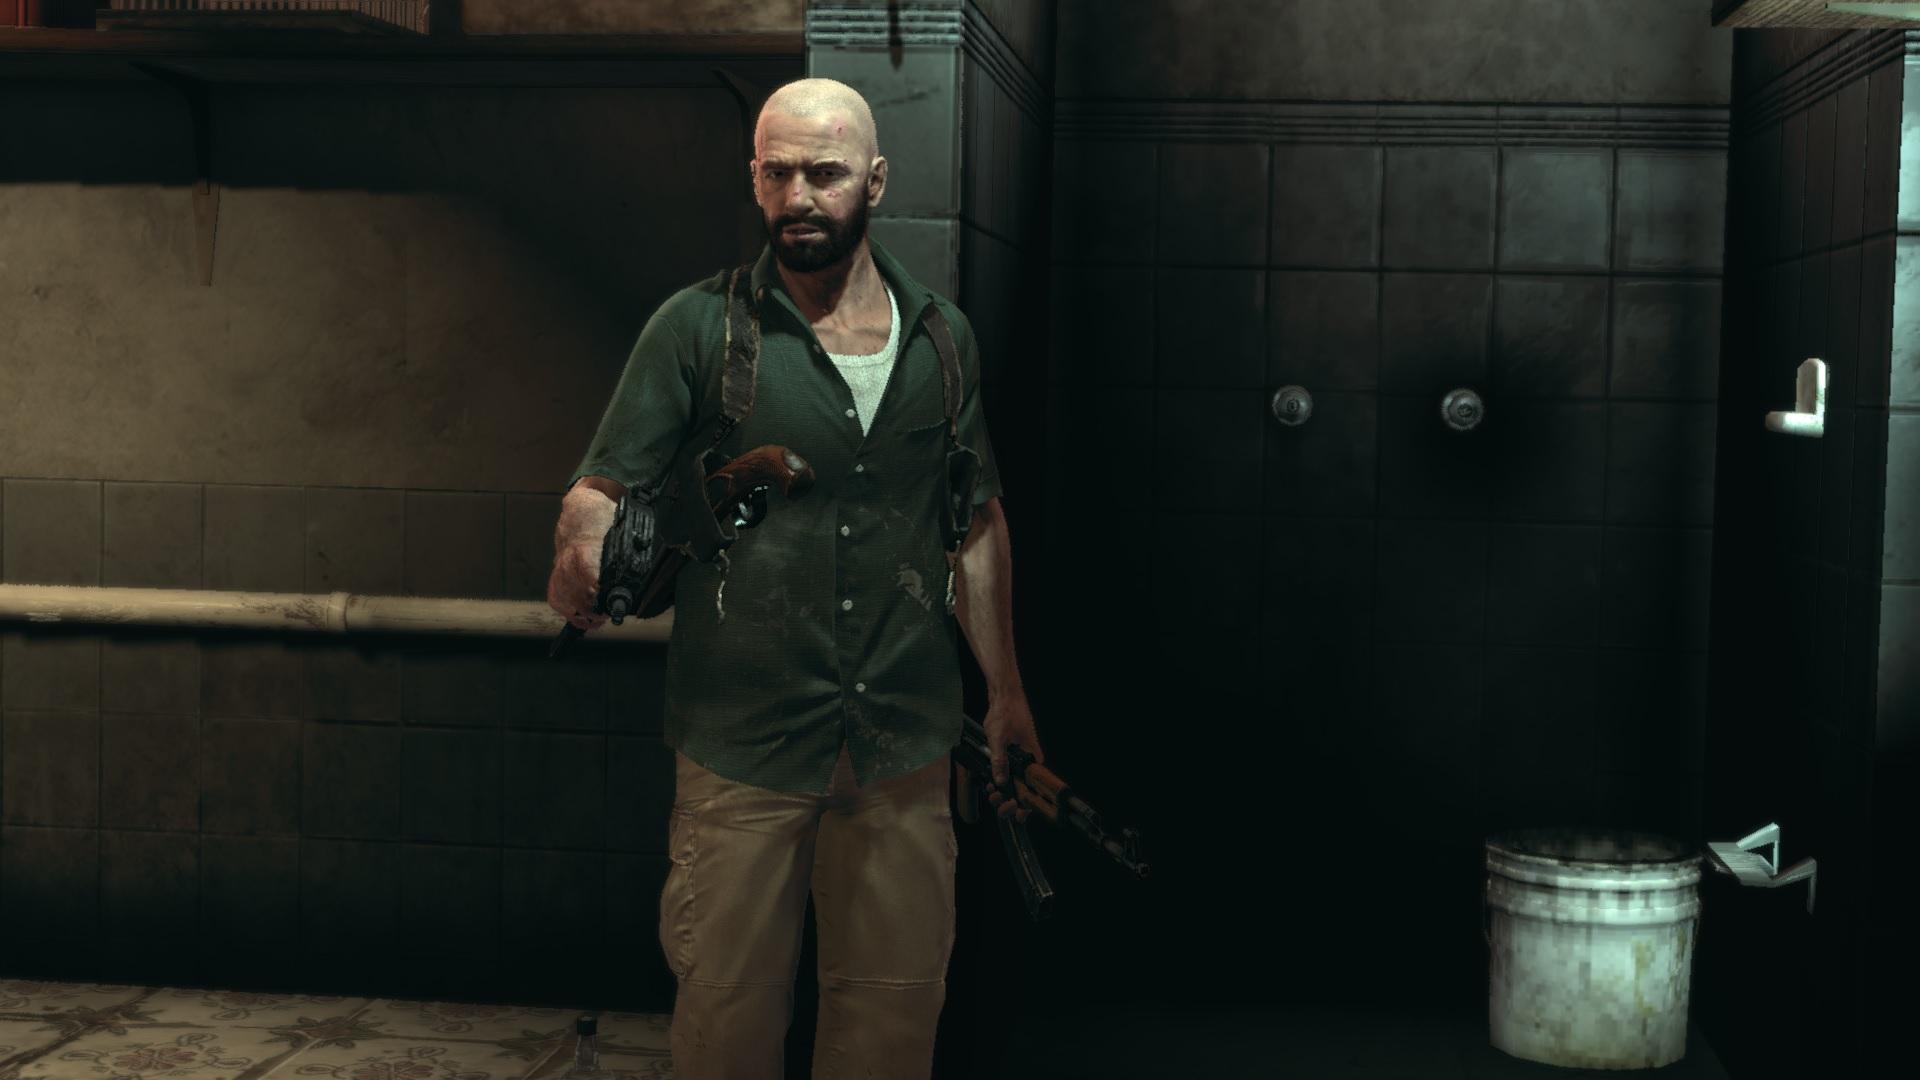 Image 1 Max Mod For Max Payne 3 For Max Payne 3 Mod Db